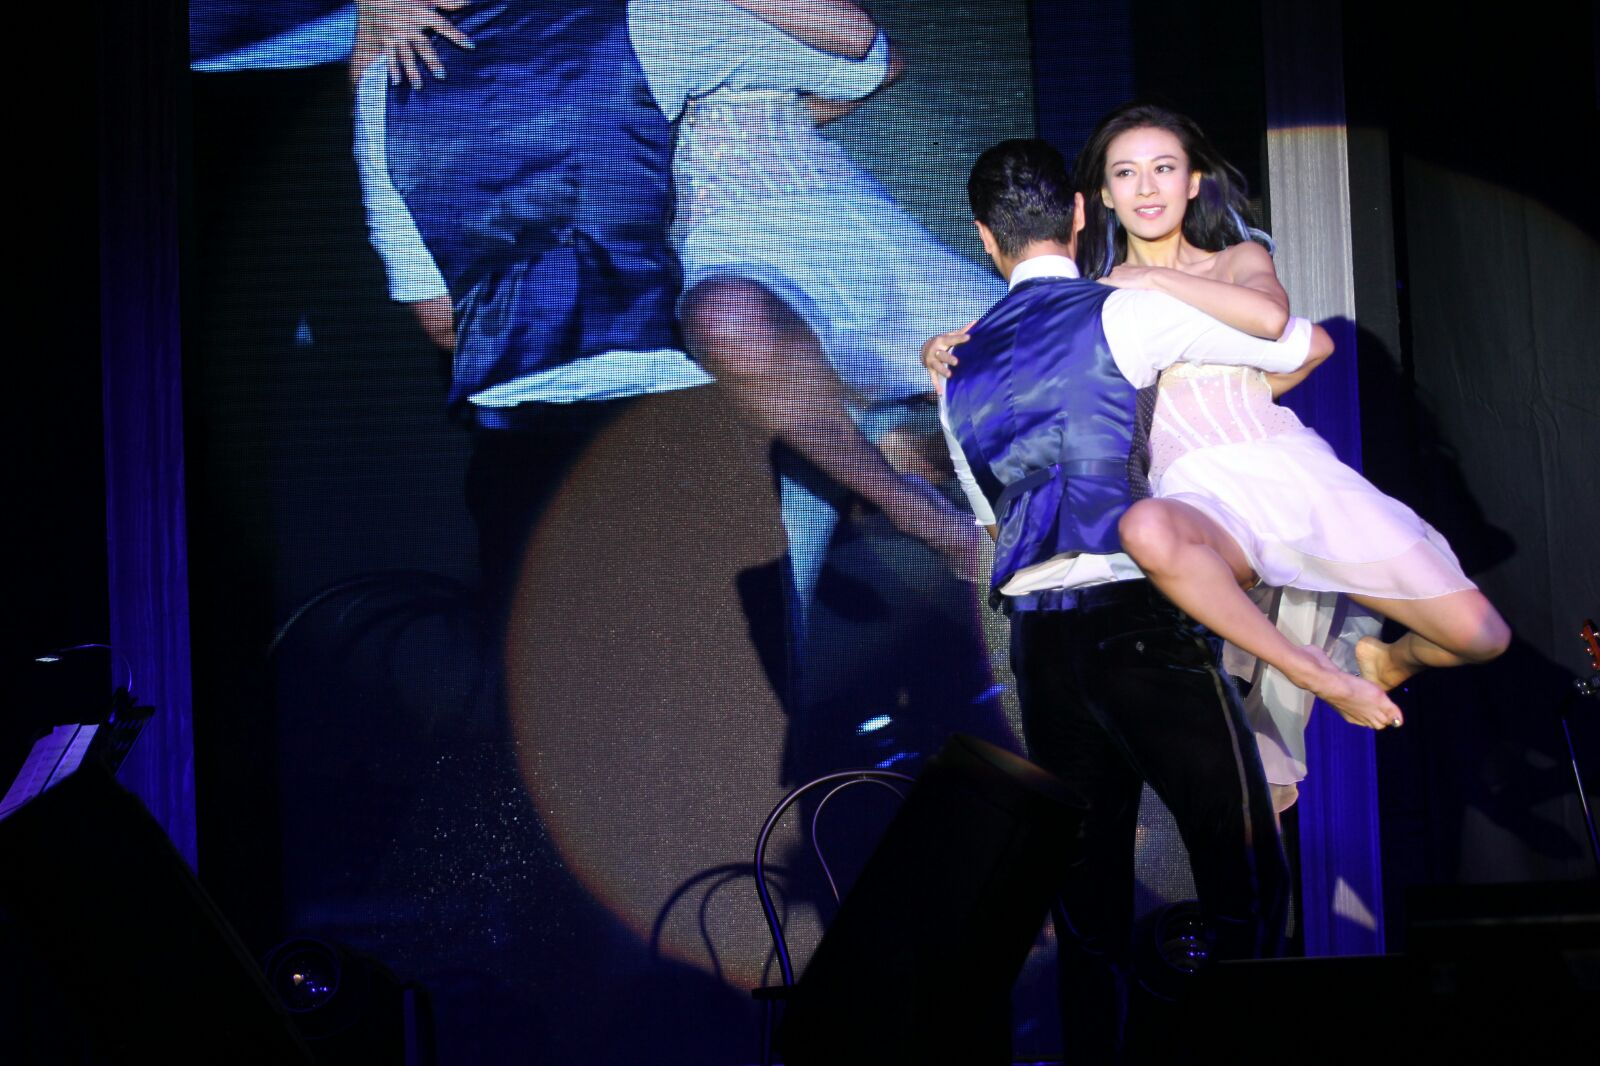 Elanne換上透視婚紗與Oscar在台上浪漫共舞。